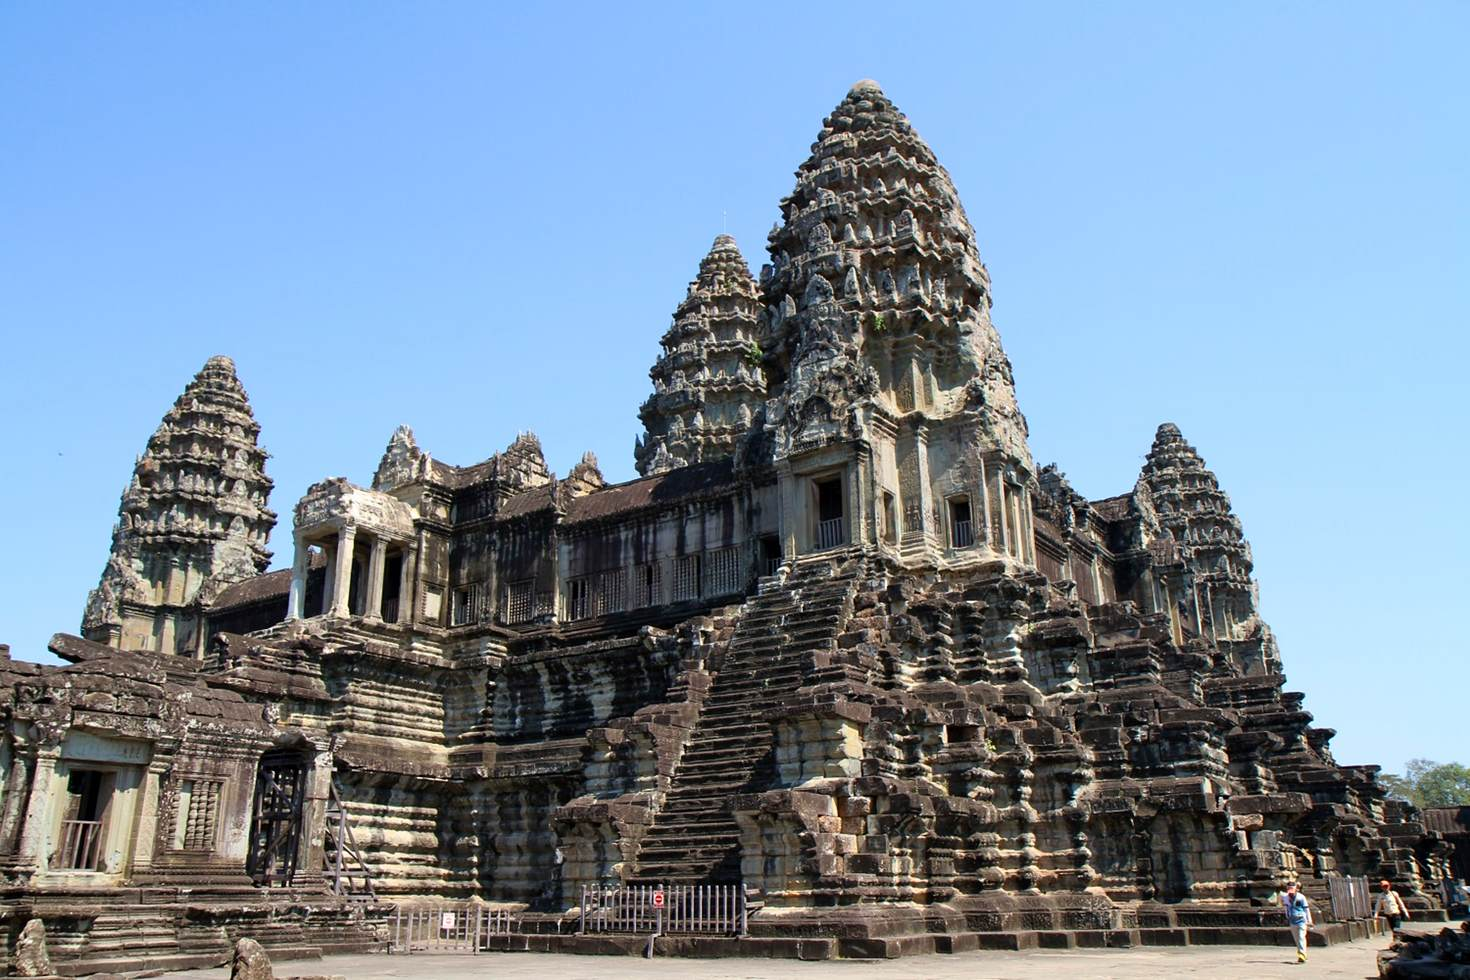 An impressive façade of Angkor Wat